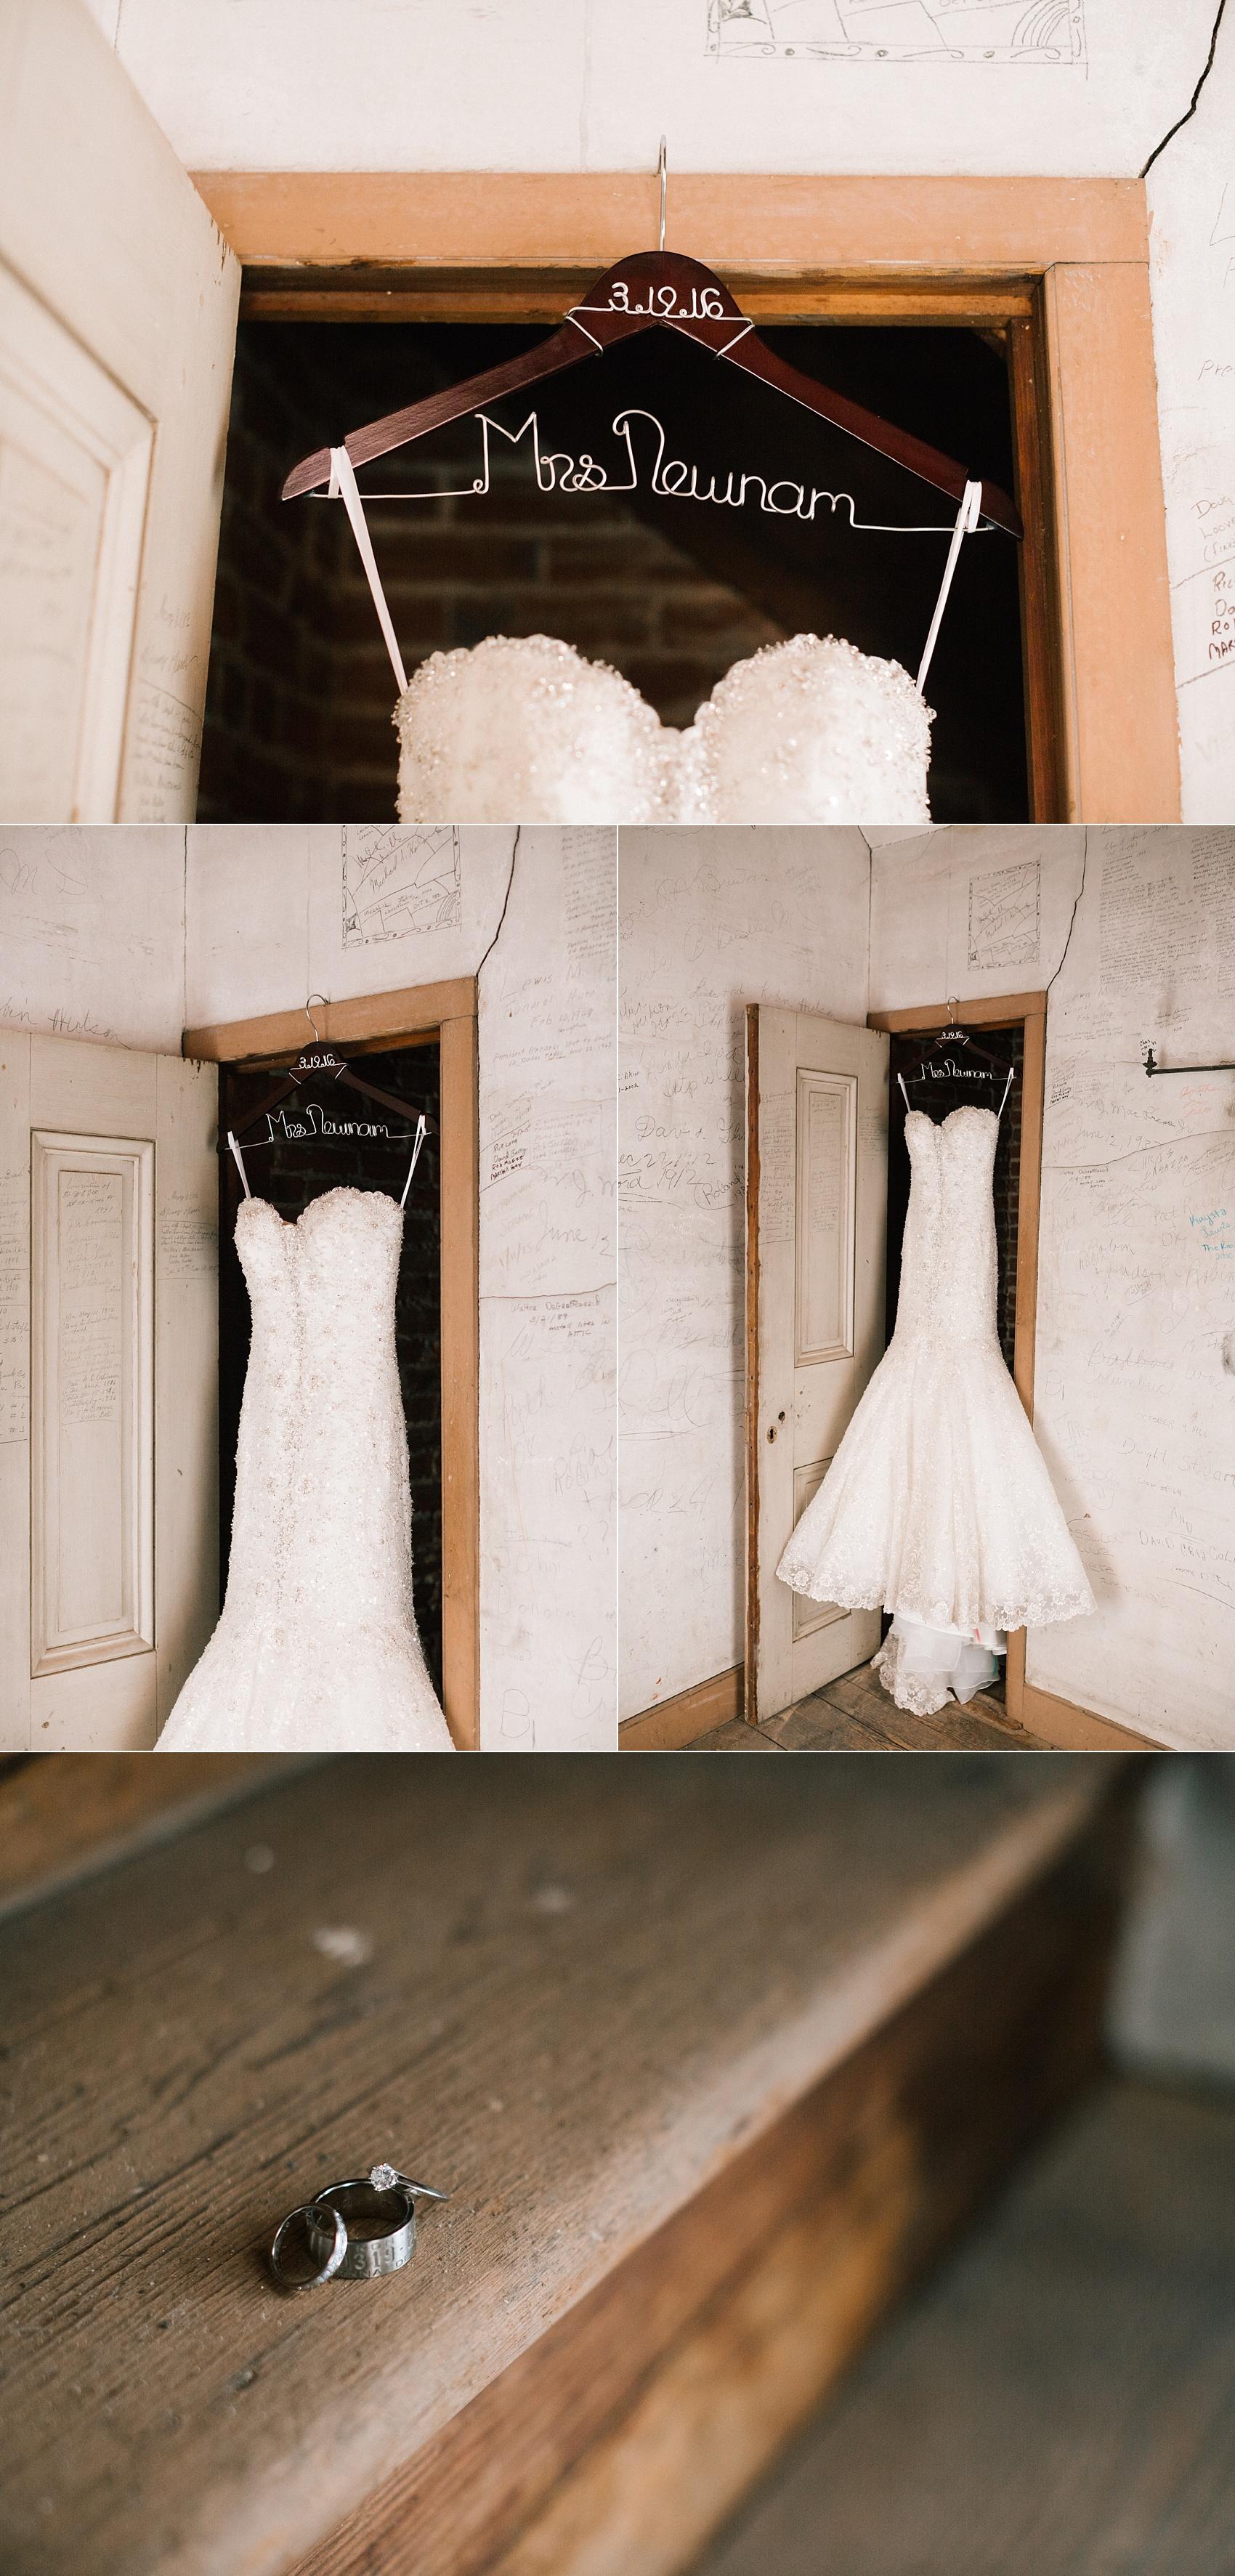 dwayne lydia delaware wedding philadelphia baltimore washingtion dc wedding photographer-5